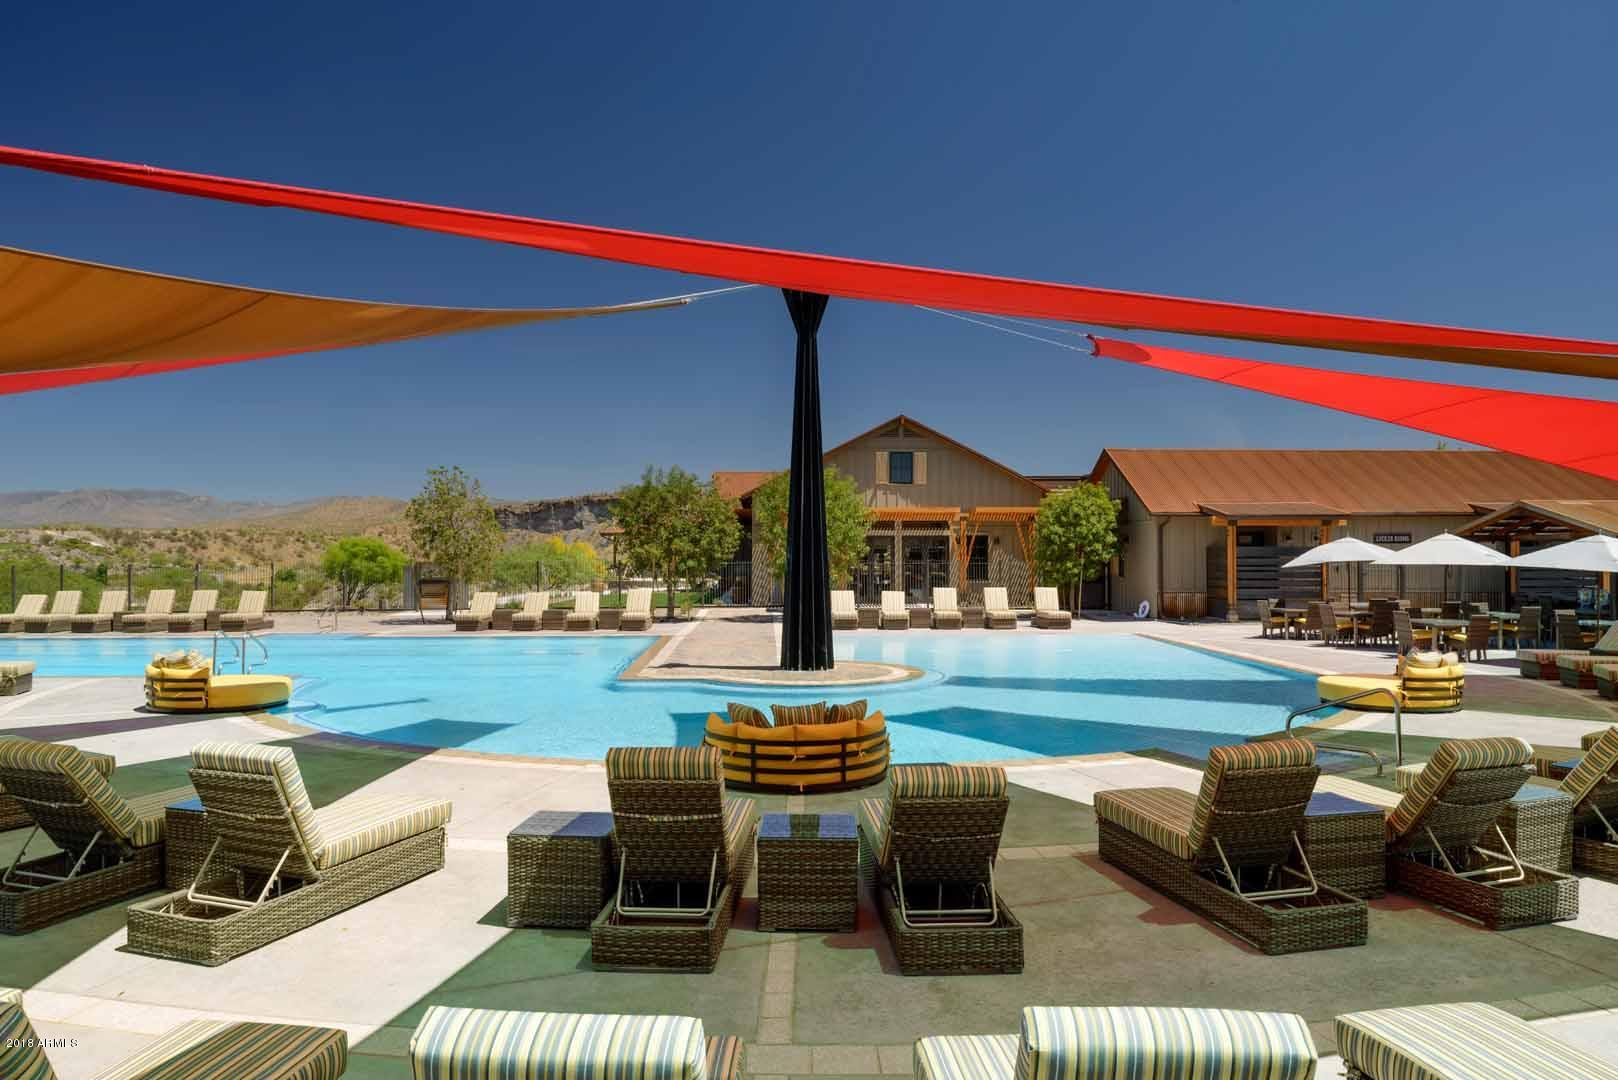 MLS 5834447 3695 Ridgeview Terrace, Wickenburg, AZ 85390 Wickenburg AZ Two Bedroom